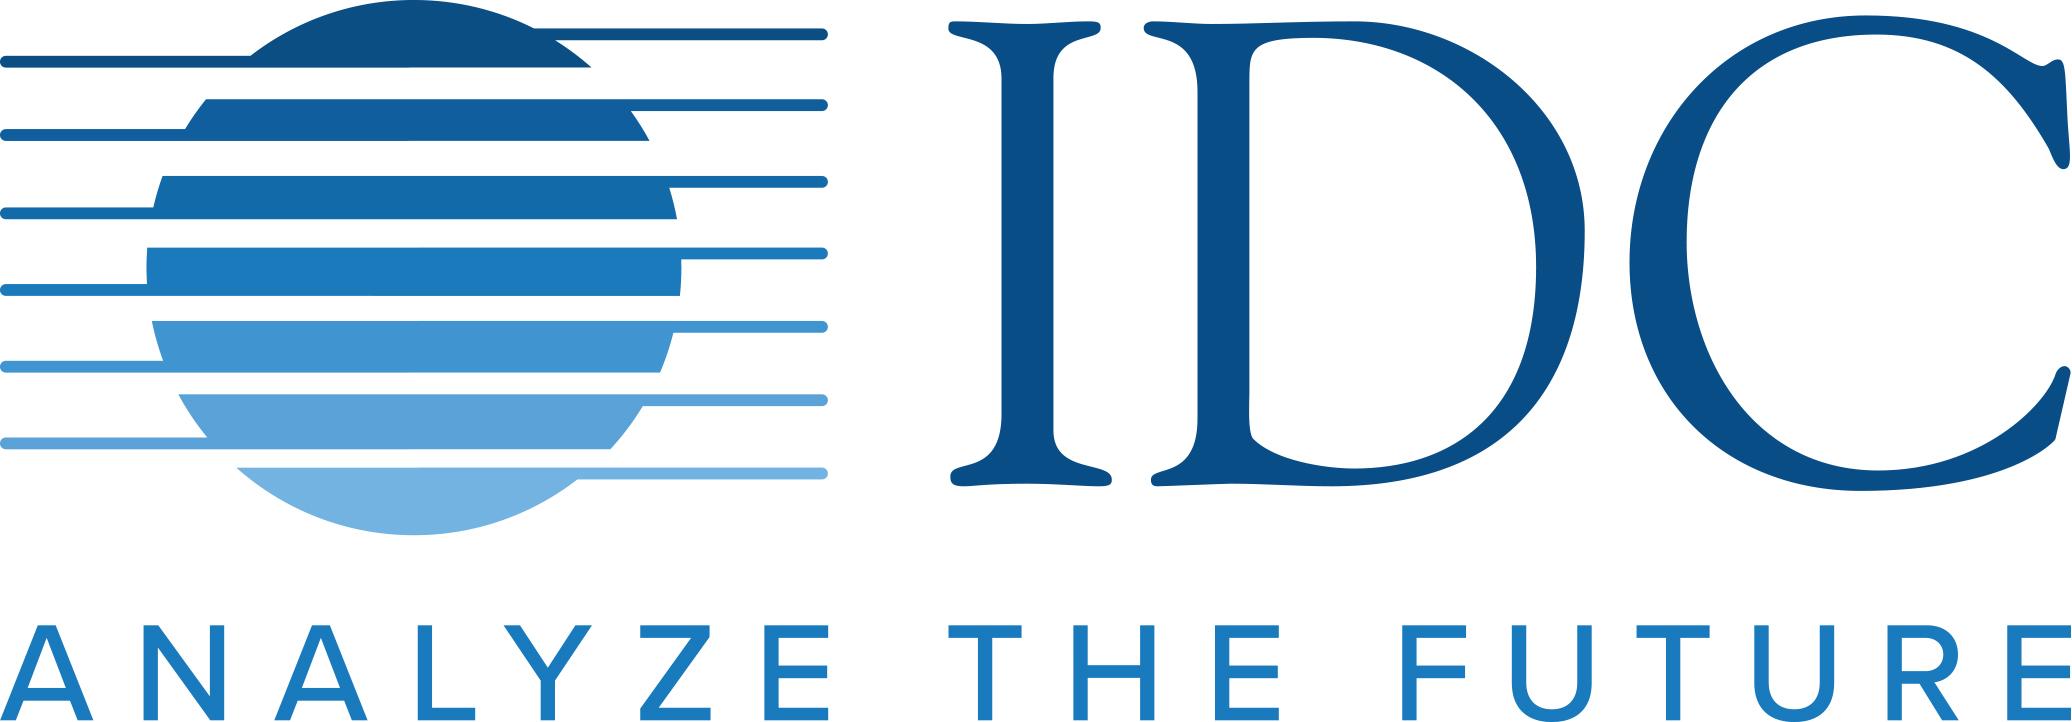 IDC-logo-vertical-fullcolor-2072x722